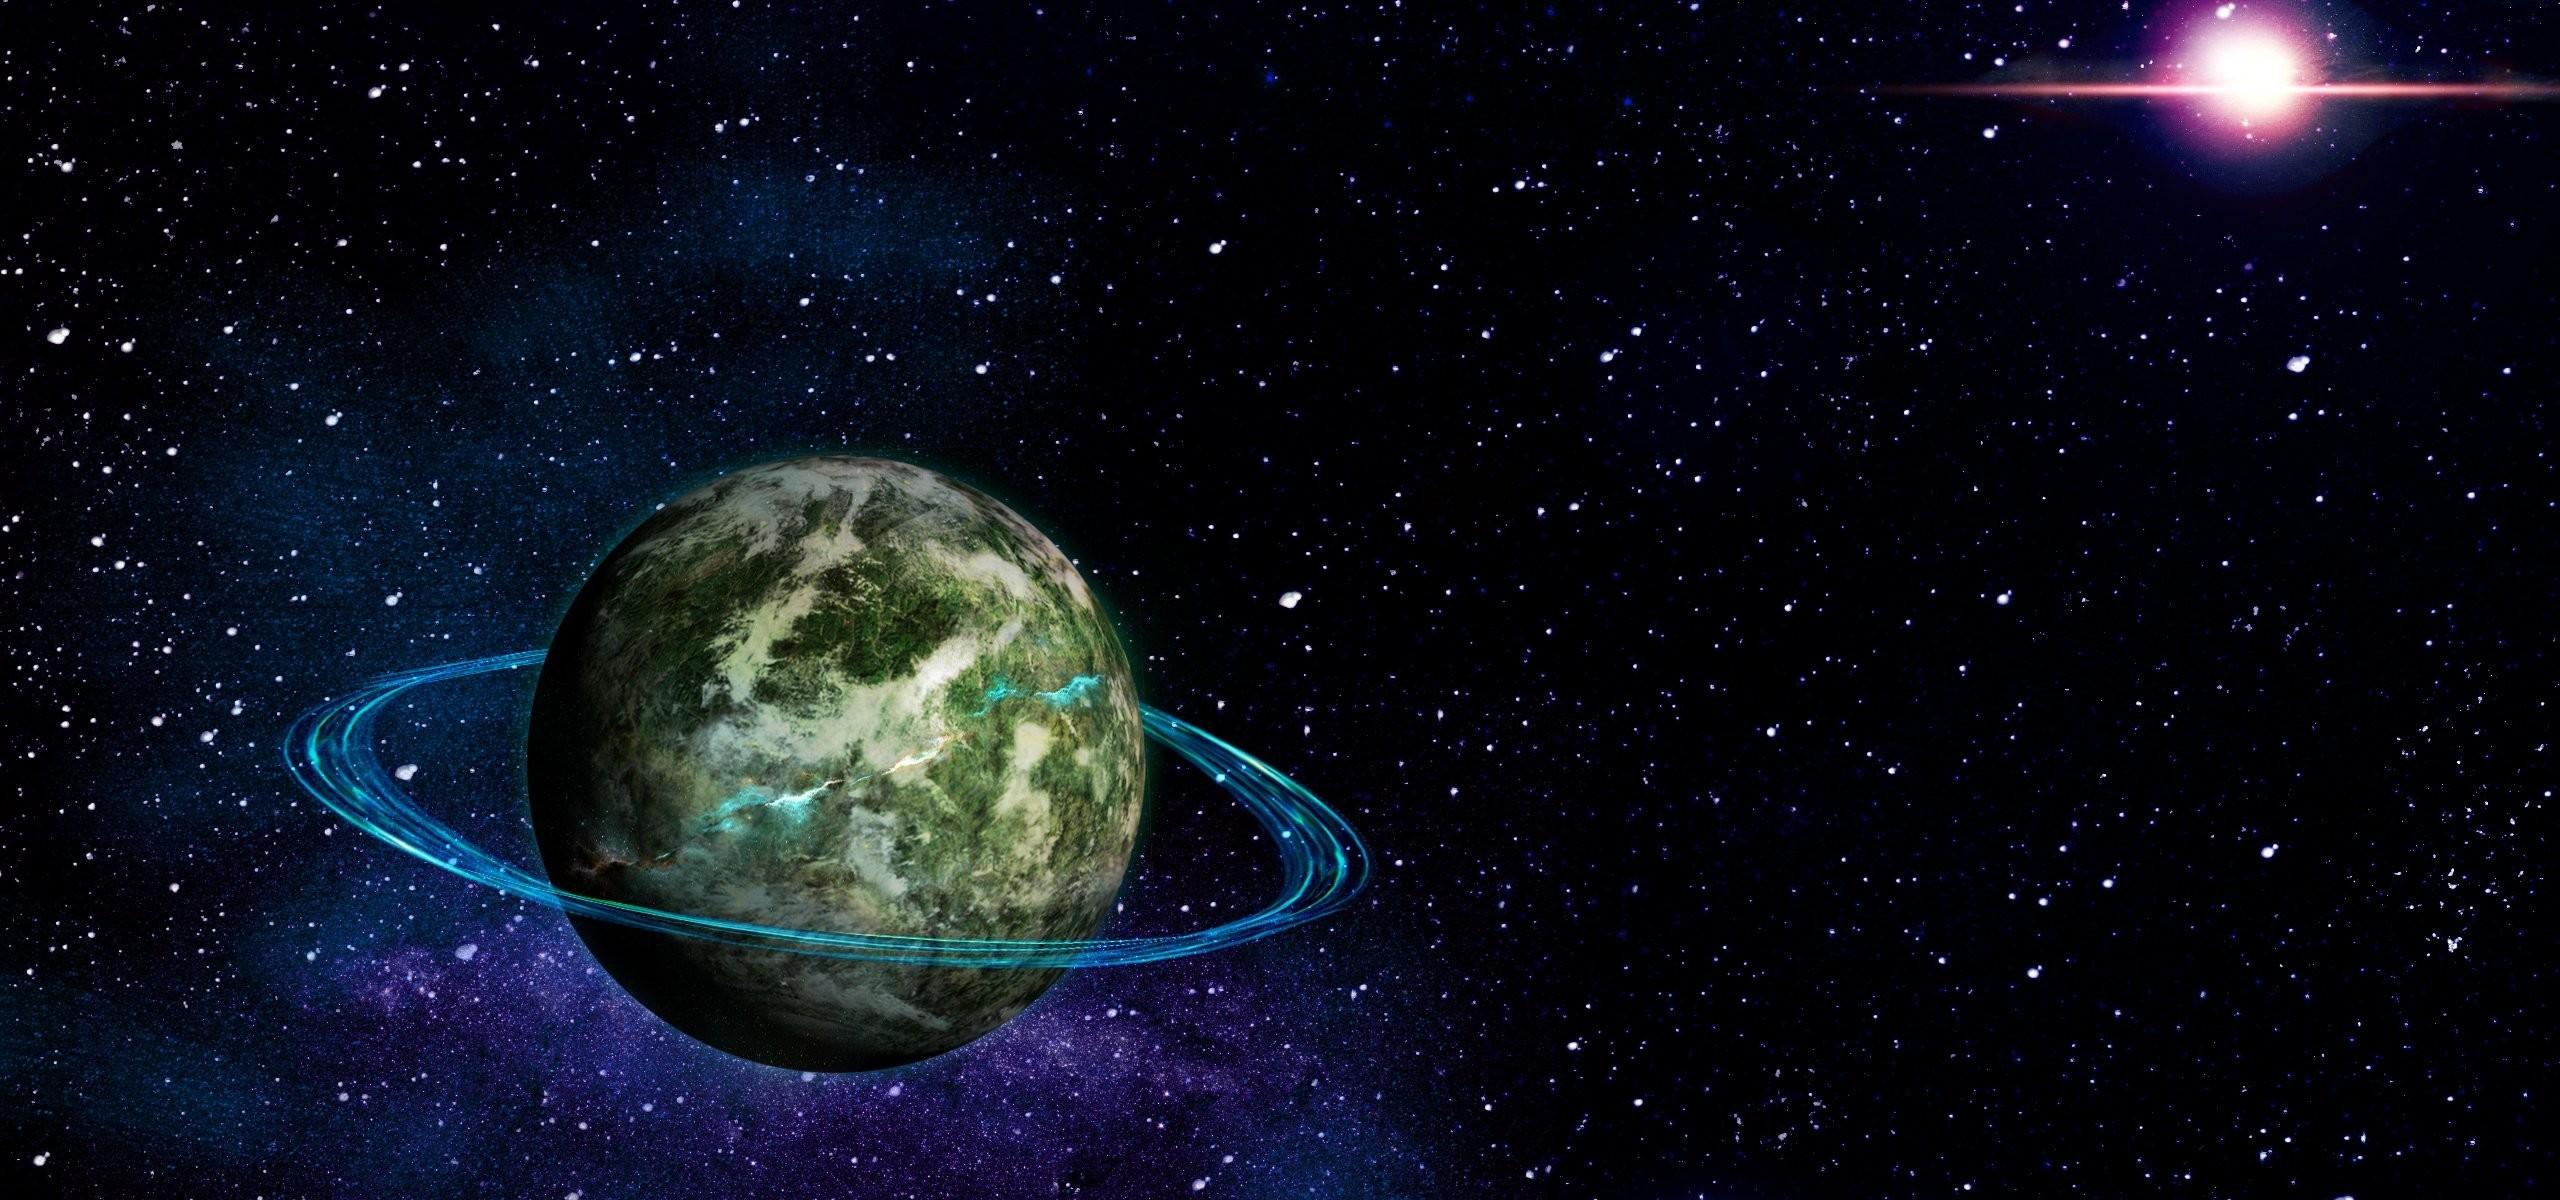 planet ring space cosmic energy stars universe supernova background